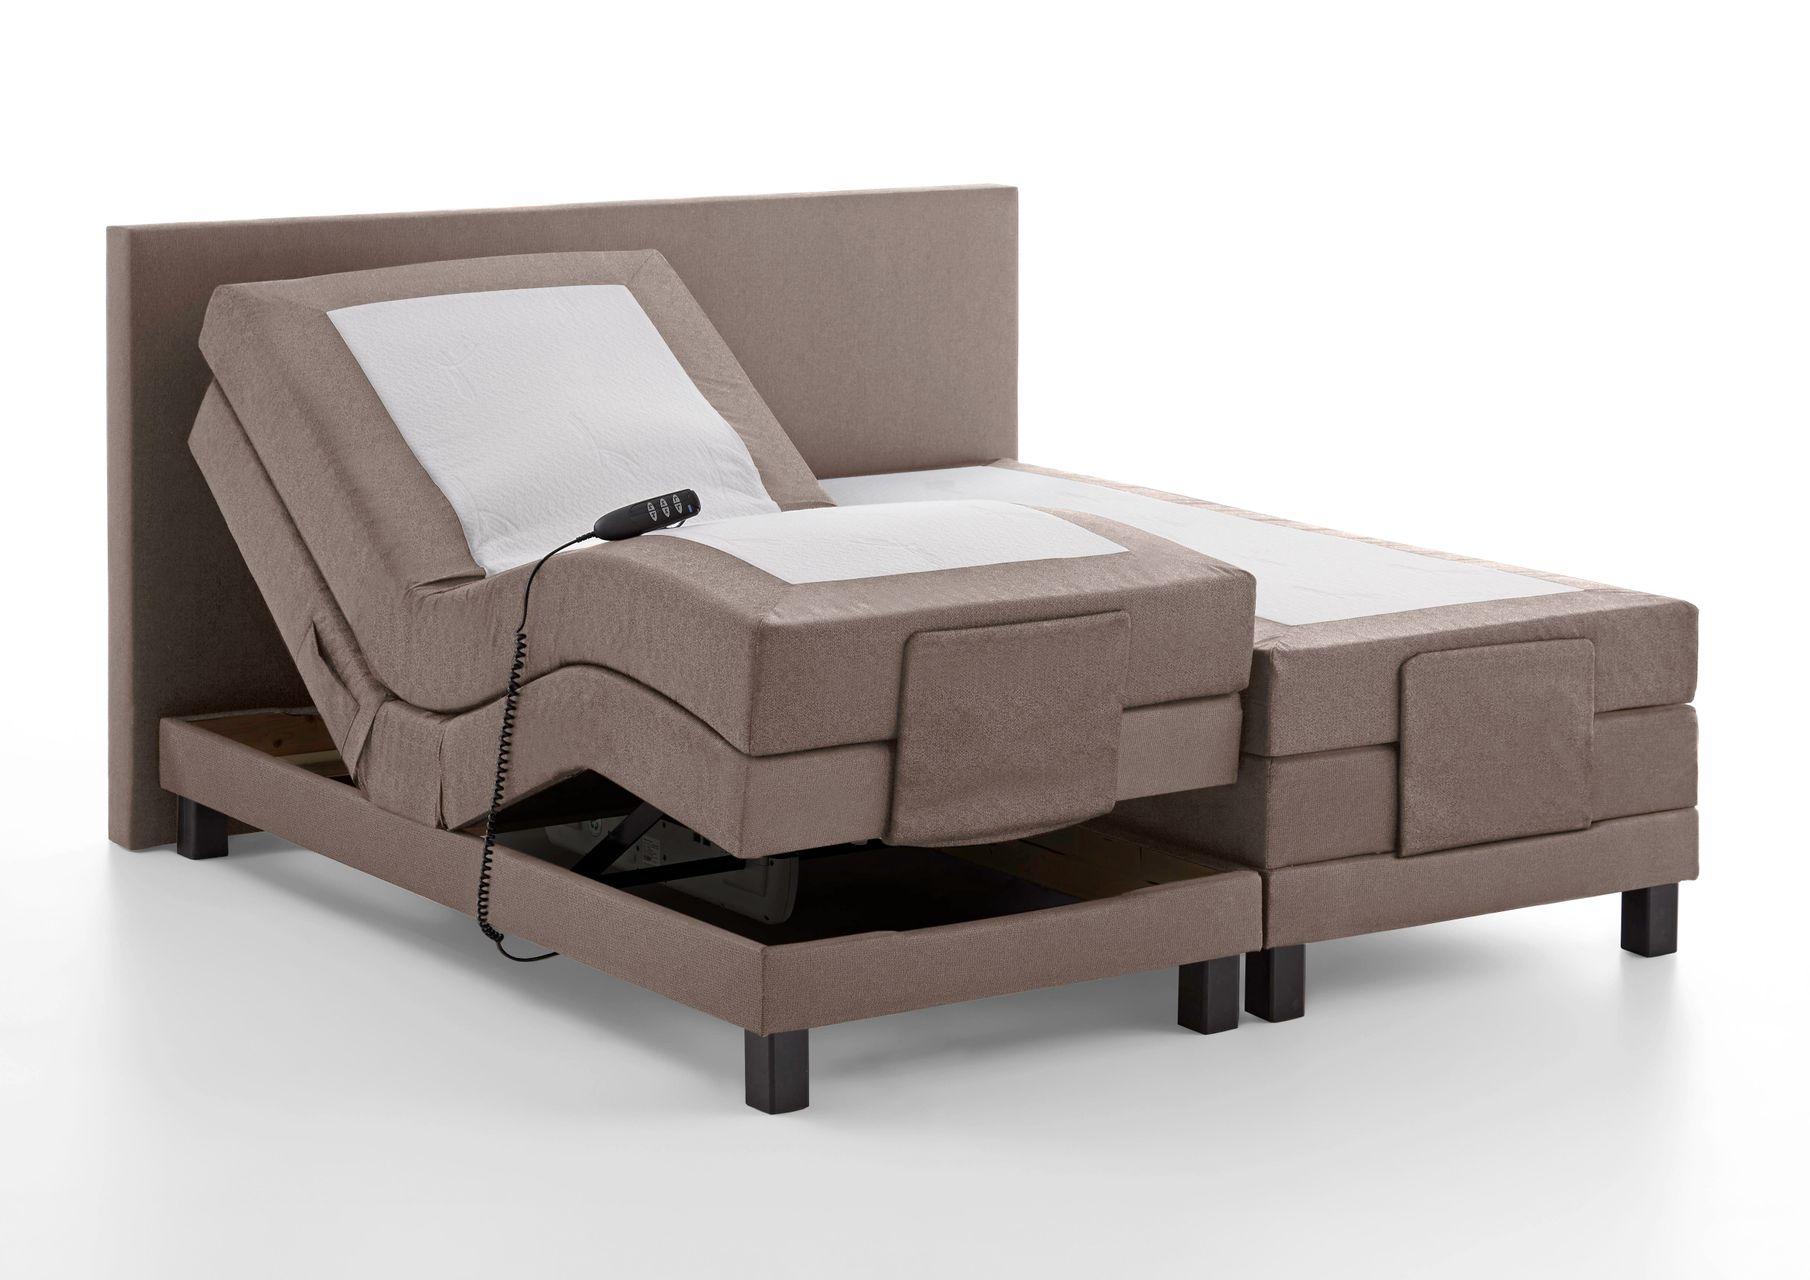 belvandeo ancona amerikanisches boxspring bett mit motor. Black Bedroom Furniture Sets. Home Design Ideas